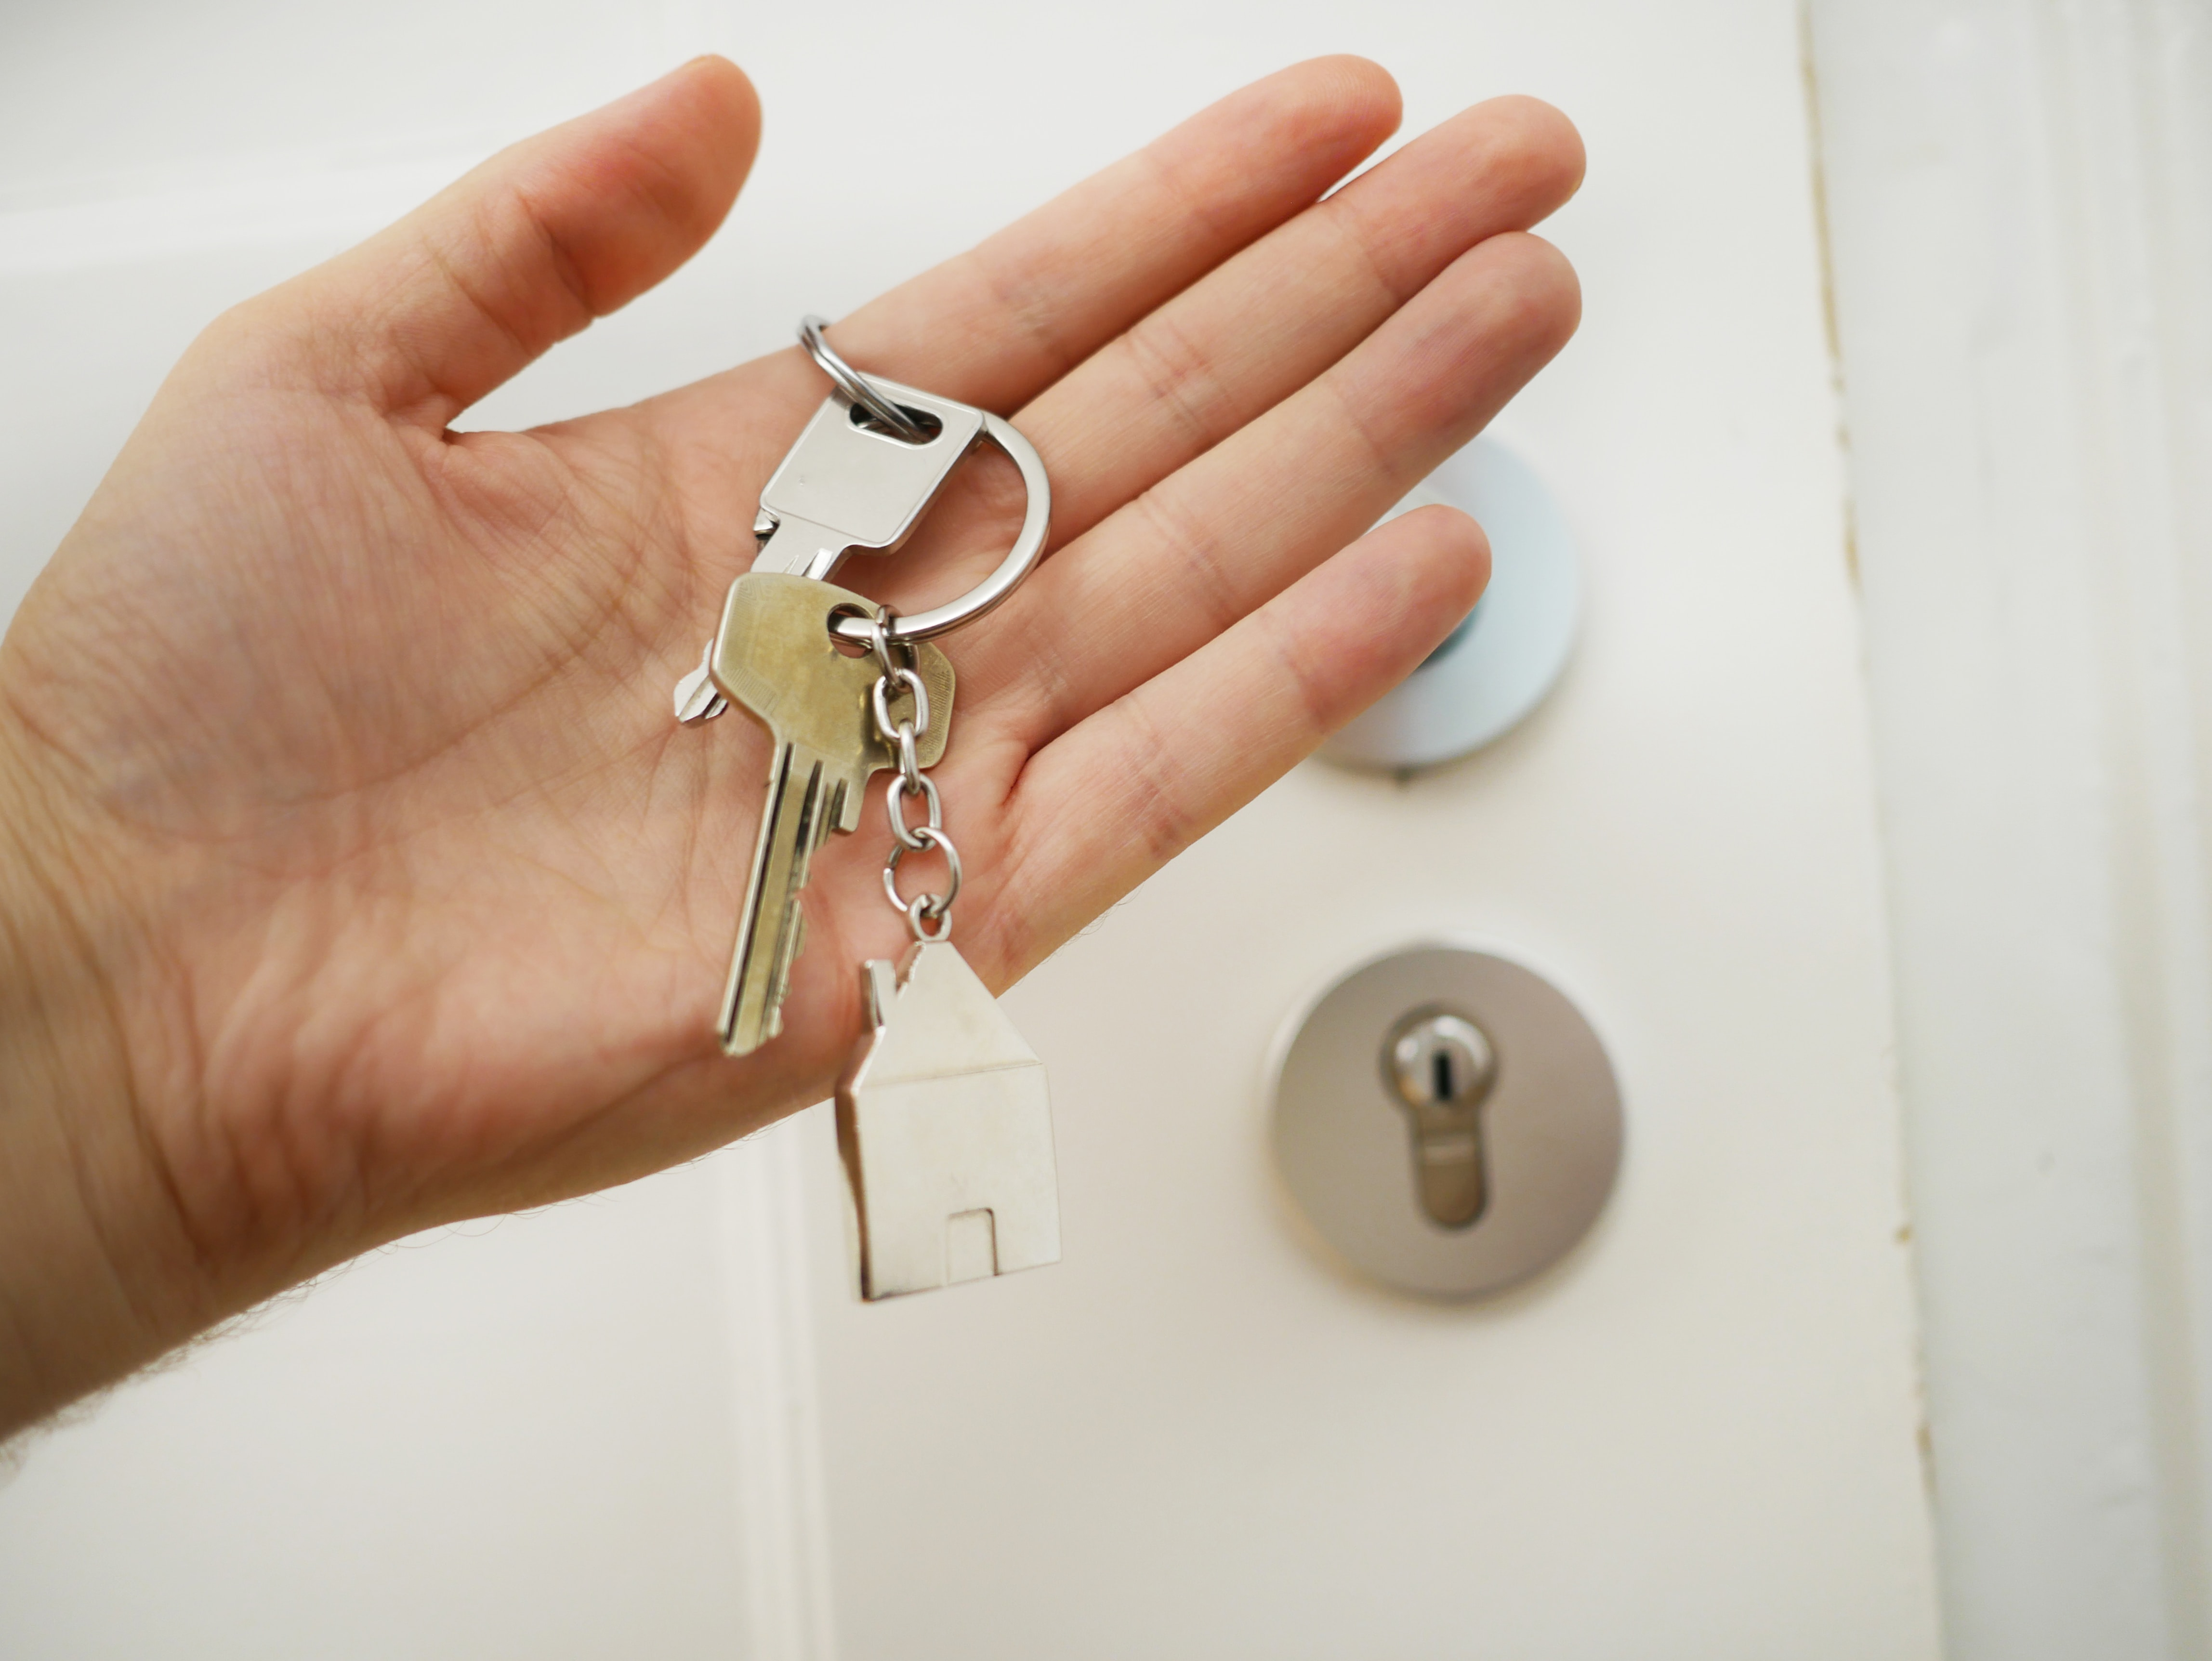 residential-locksmith-in-baltimore